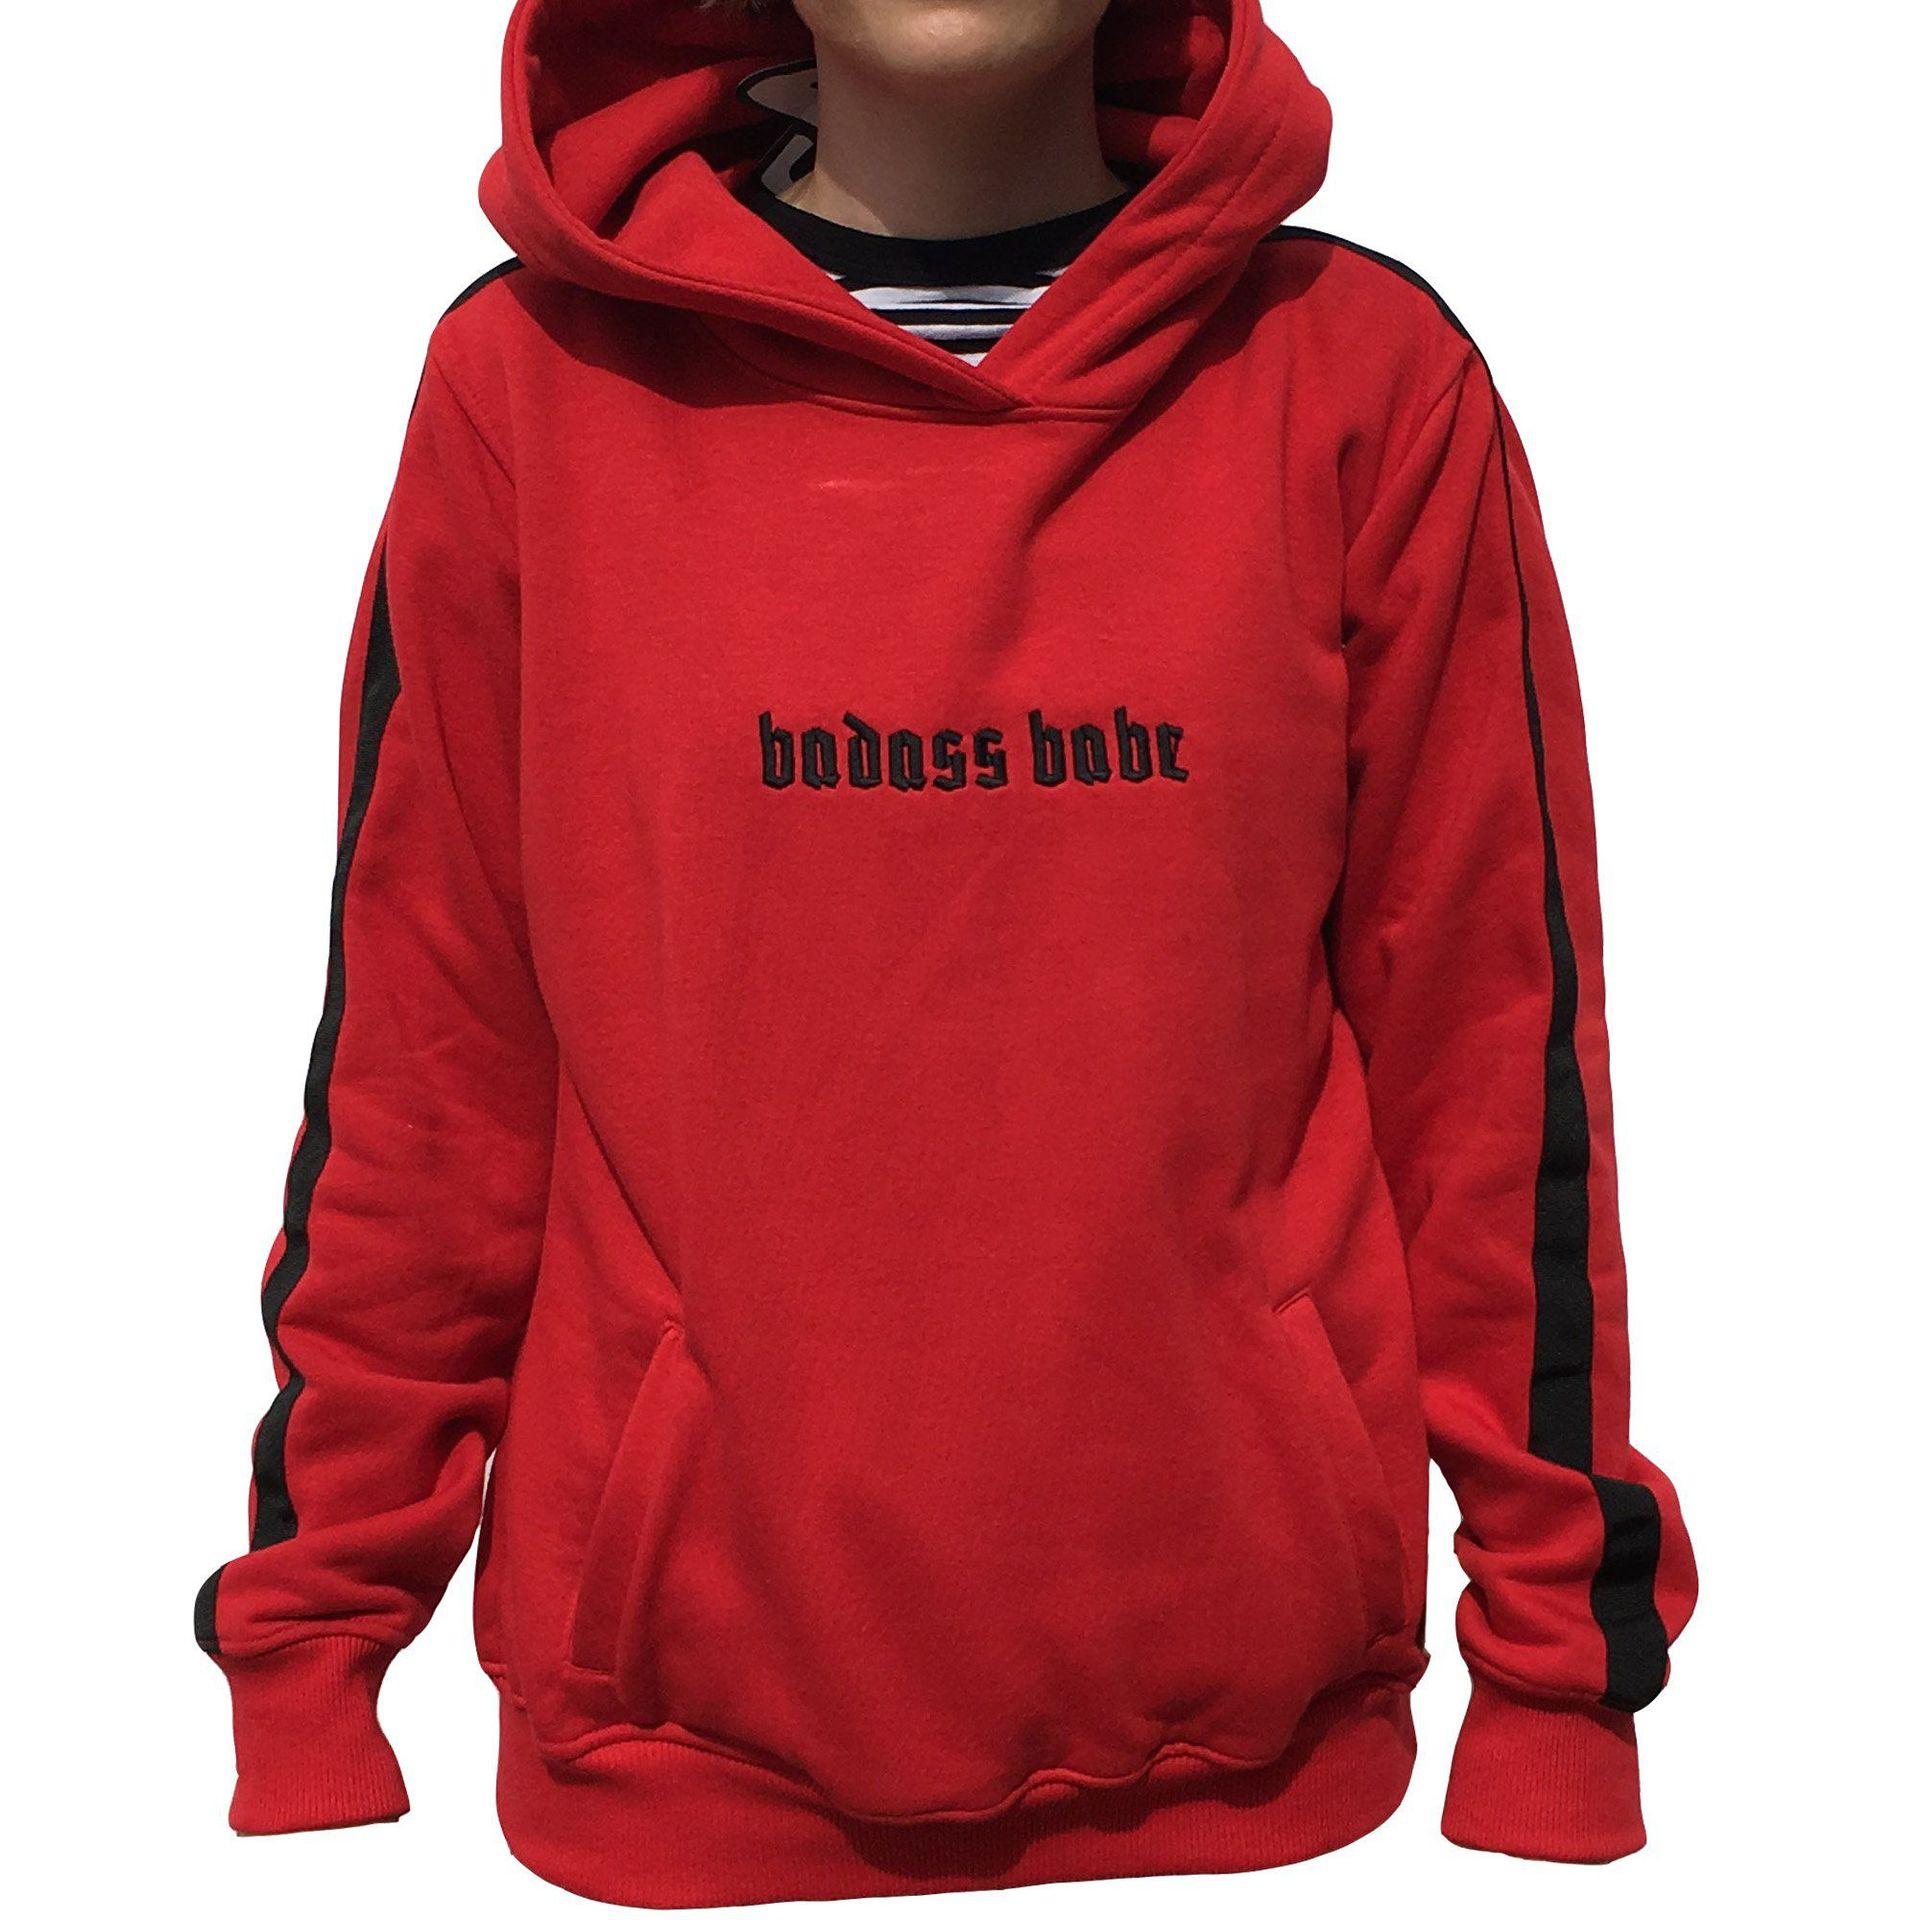 BLUZA JUNGMOB BADASS BABE RED 1